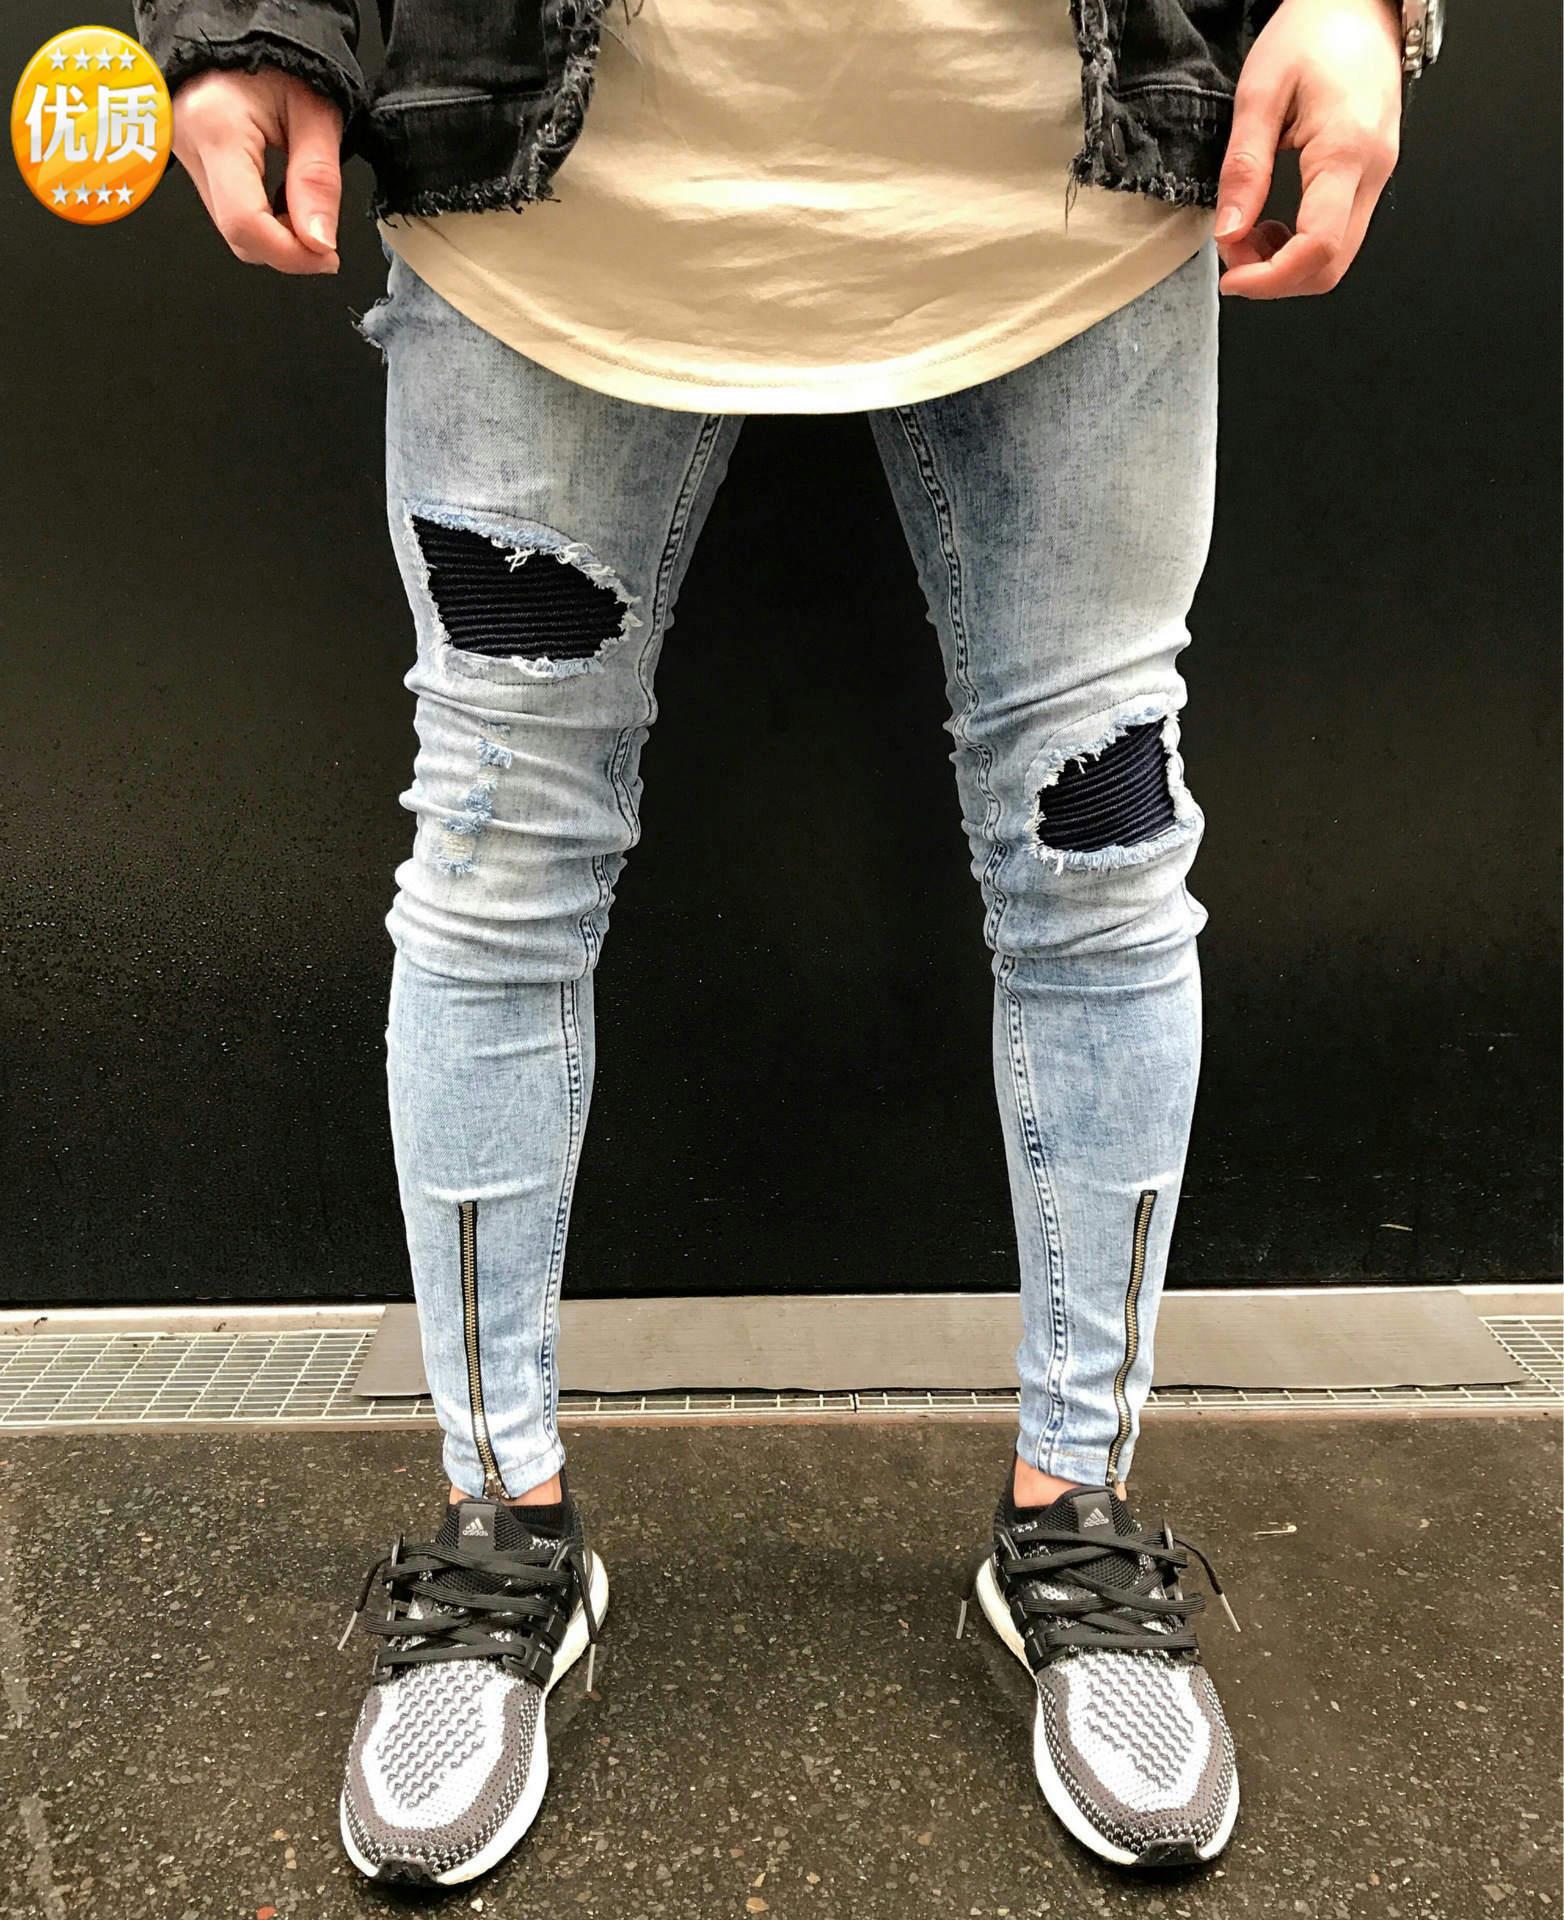 Fashion Solid Color Men Jeans 2019 New Spring Summer Skinny Fit Jeans Men Stretch Pants Elastic Skinny Jeans For Mens